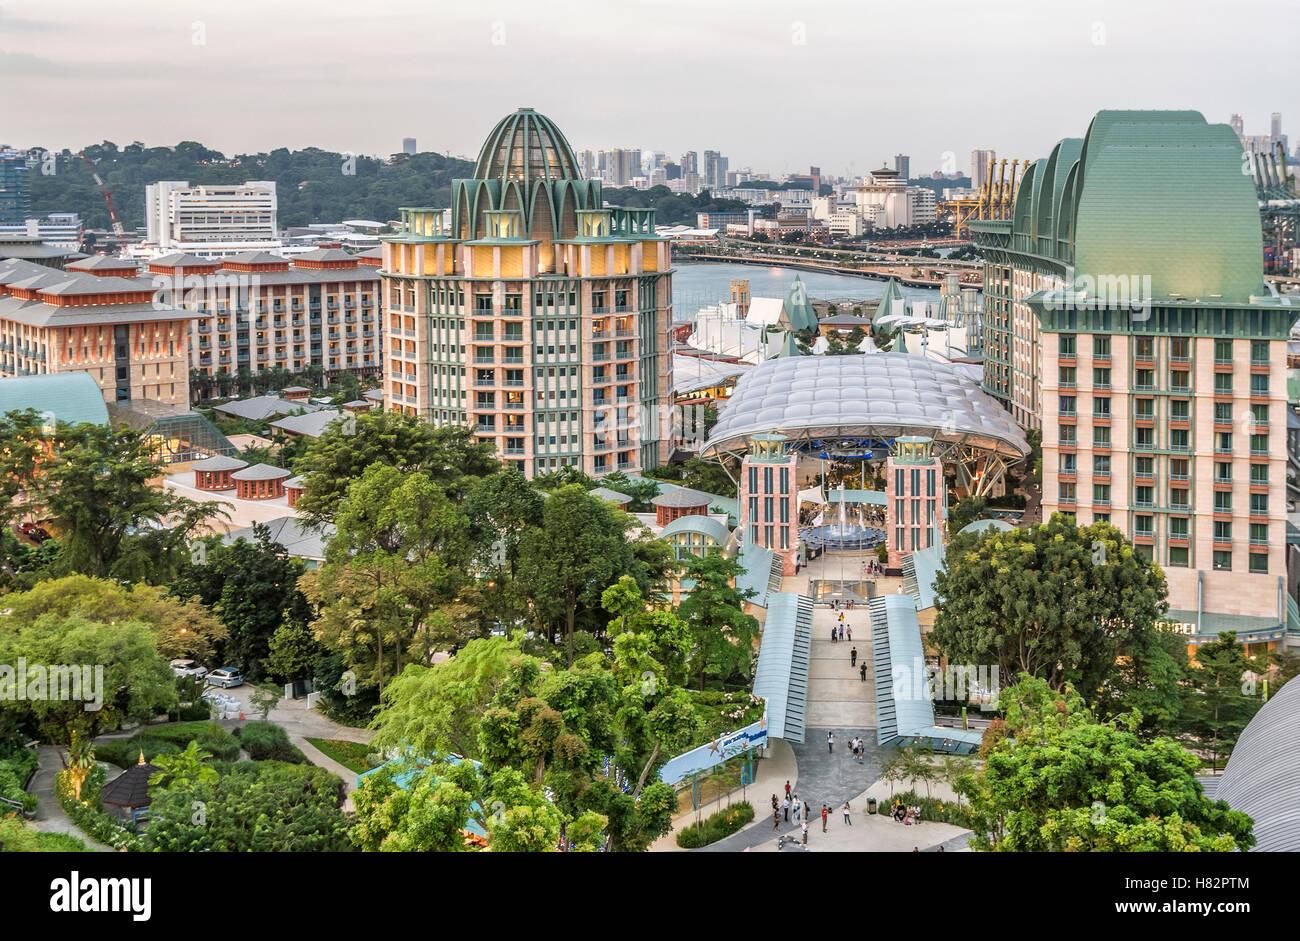 View from the Merlion Statue across the Sentosa Island Resort, Singapore. Aussicht vom Merlion ueber Sentosa, Singapur - Stock Image